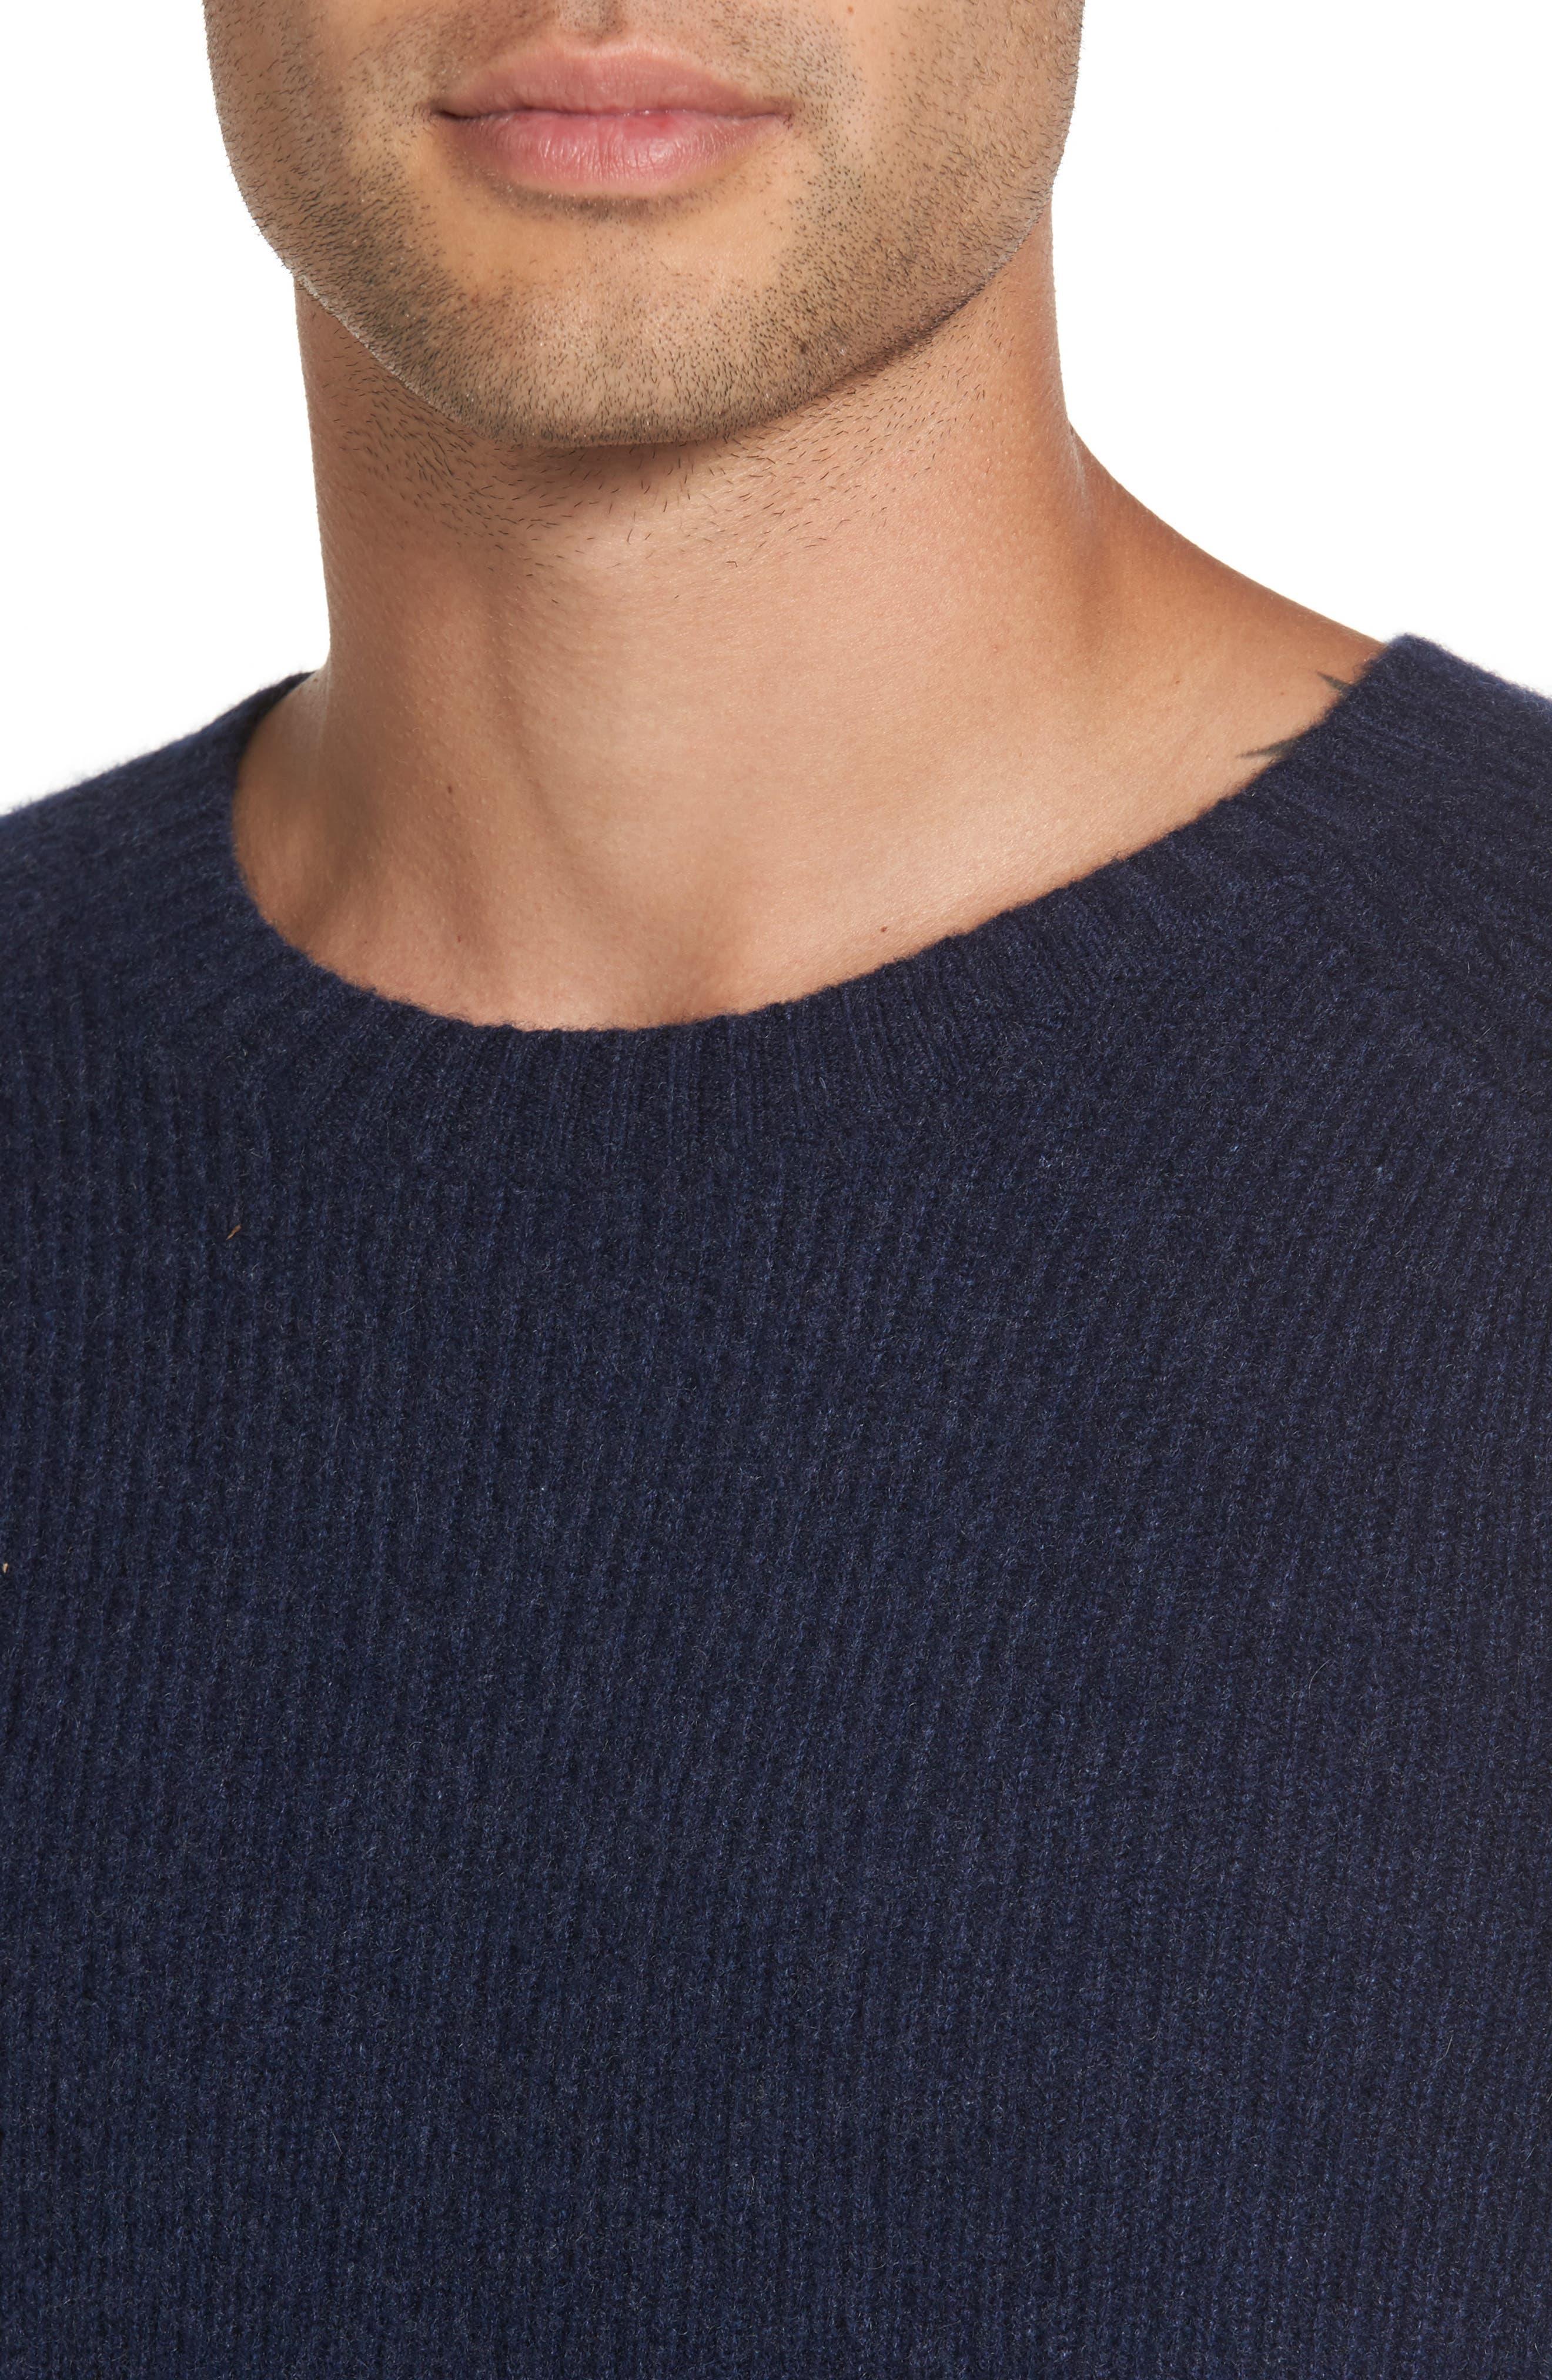 Ribbed Wool & Cashmere Raglan Sweater,                             Alternate thumbnail 4, color,                             Coastal